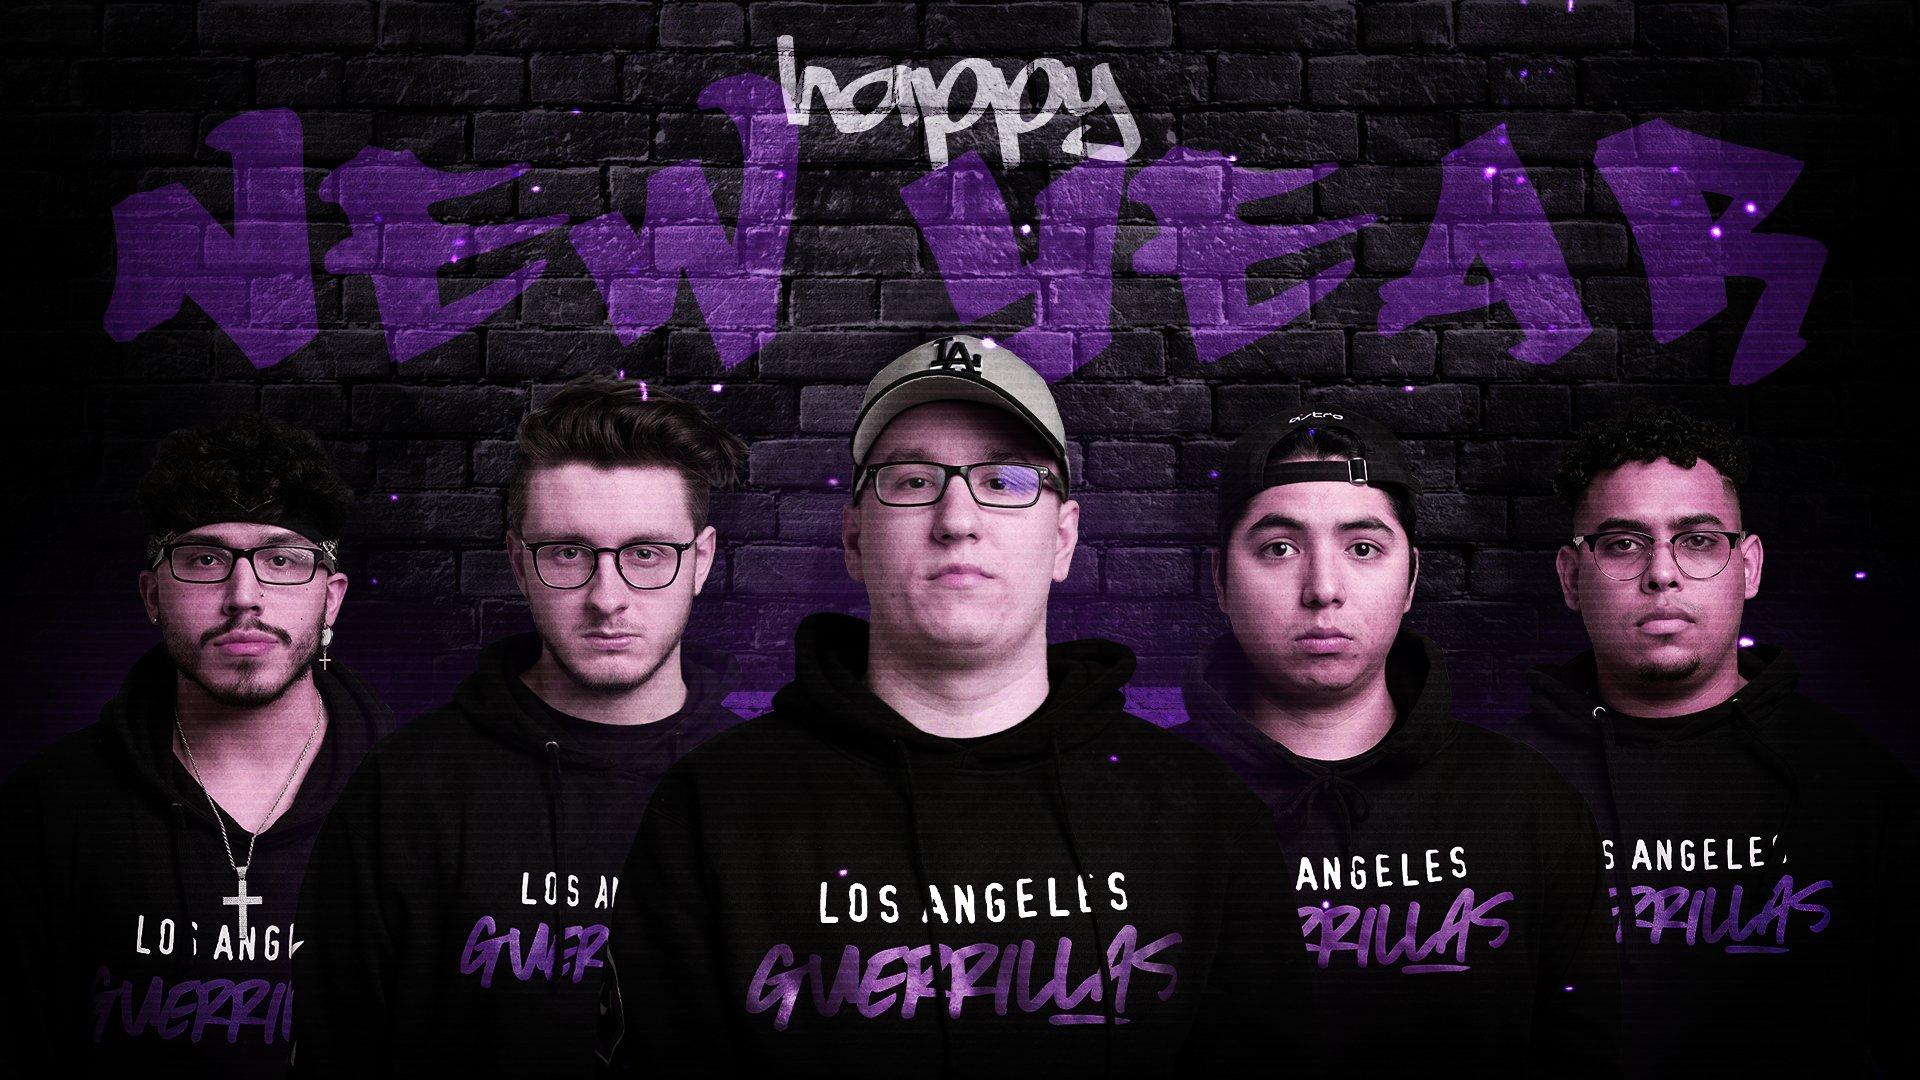 Los Angeles Guerrillas - Twitter